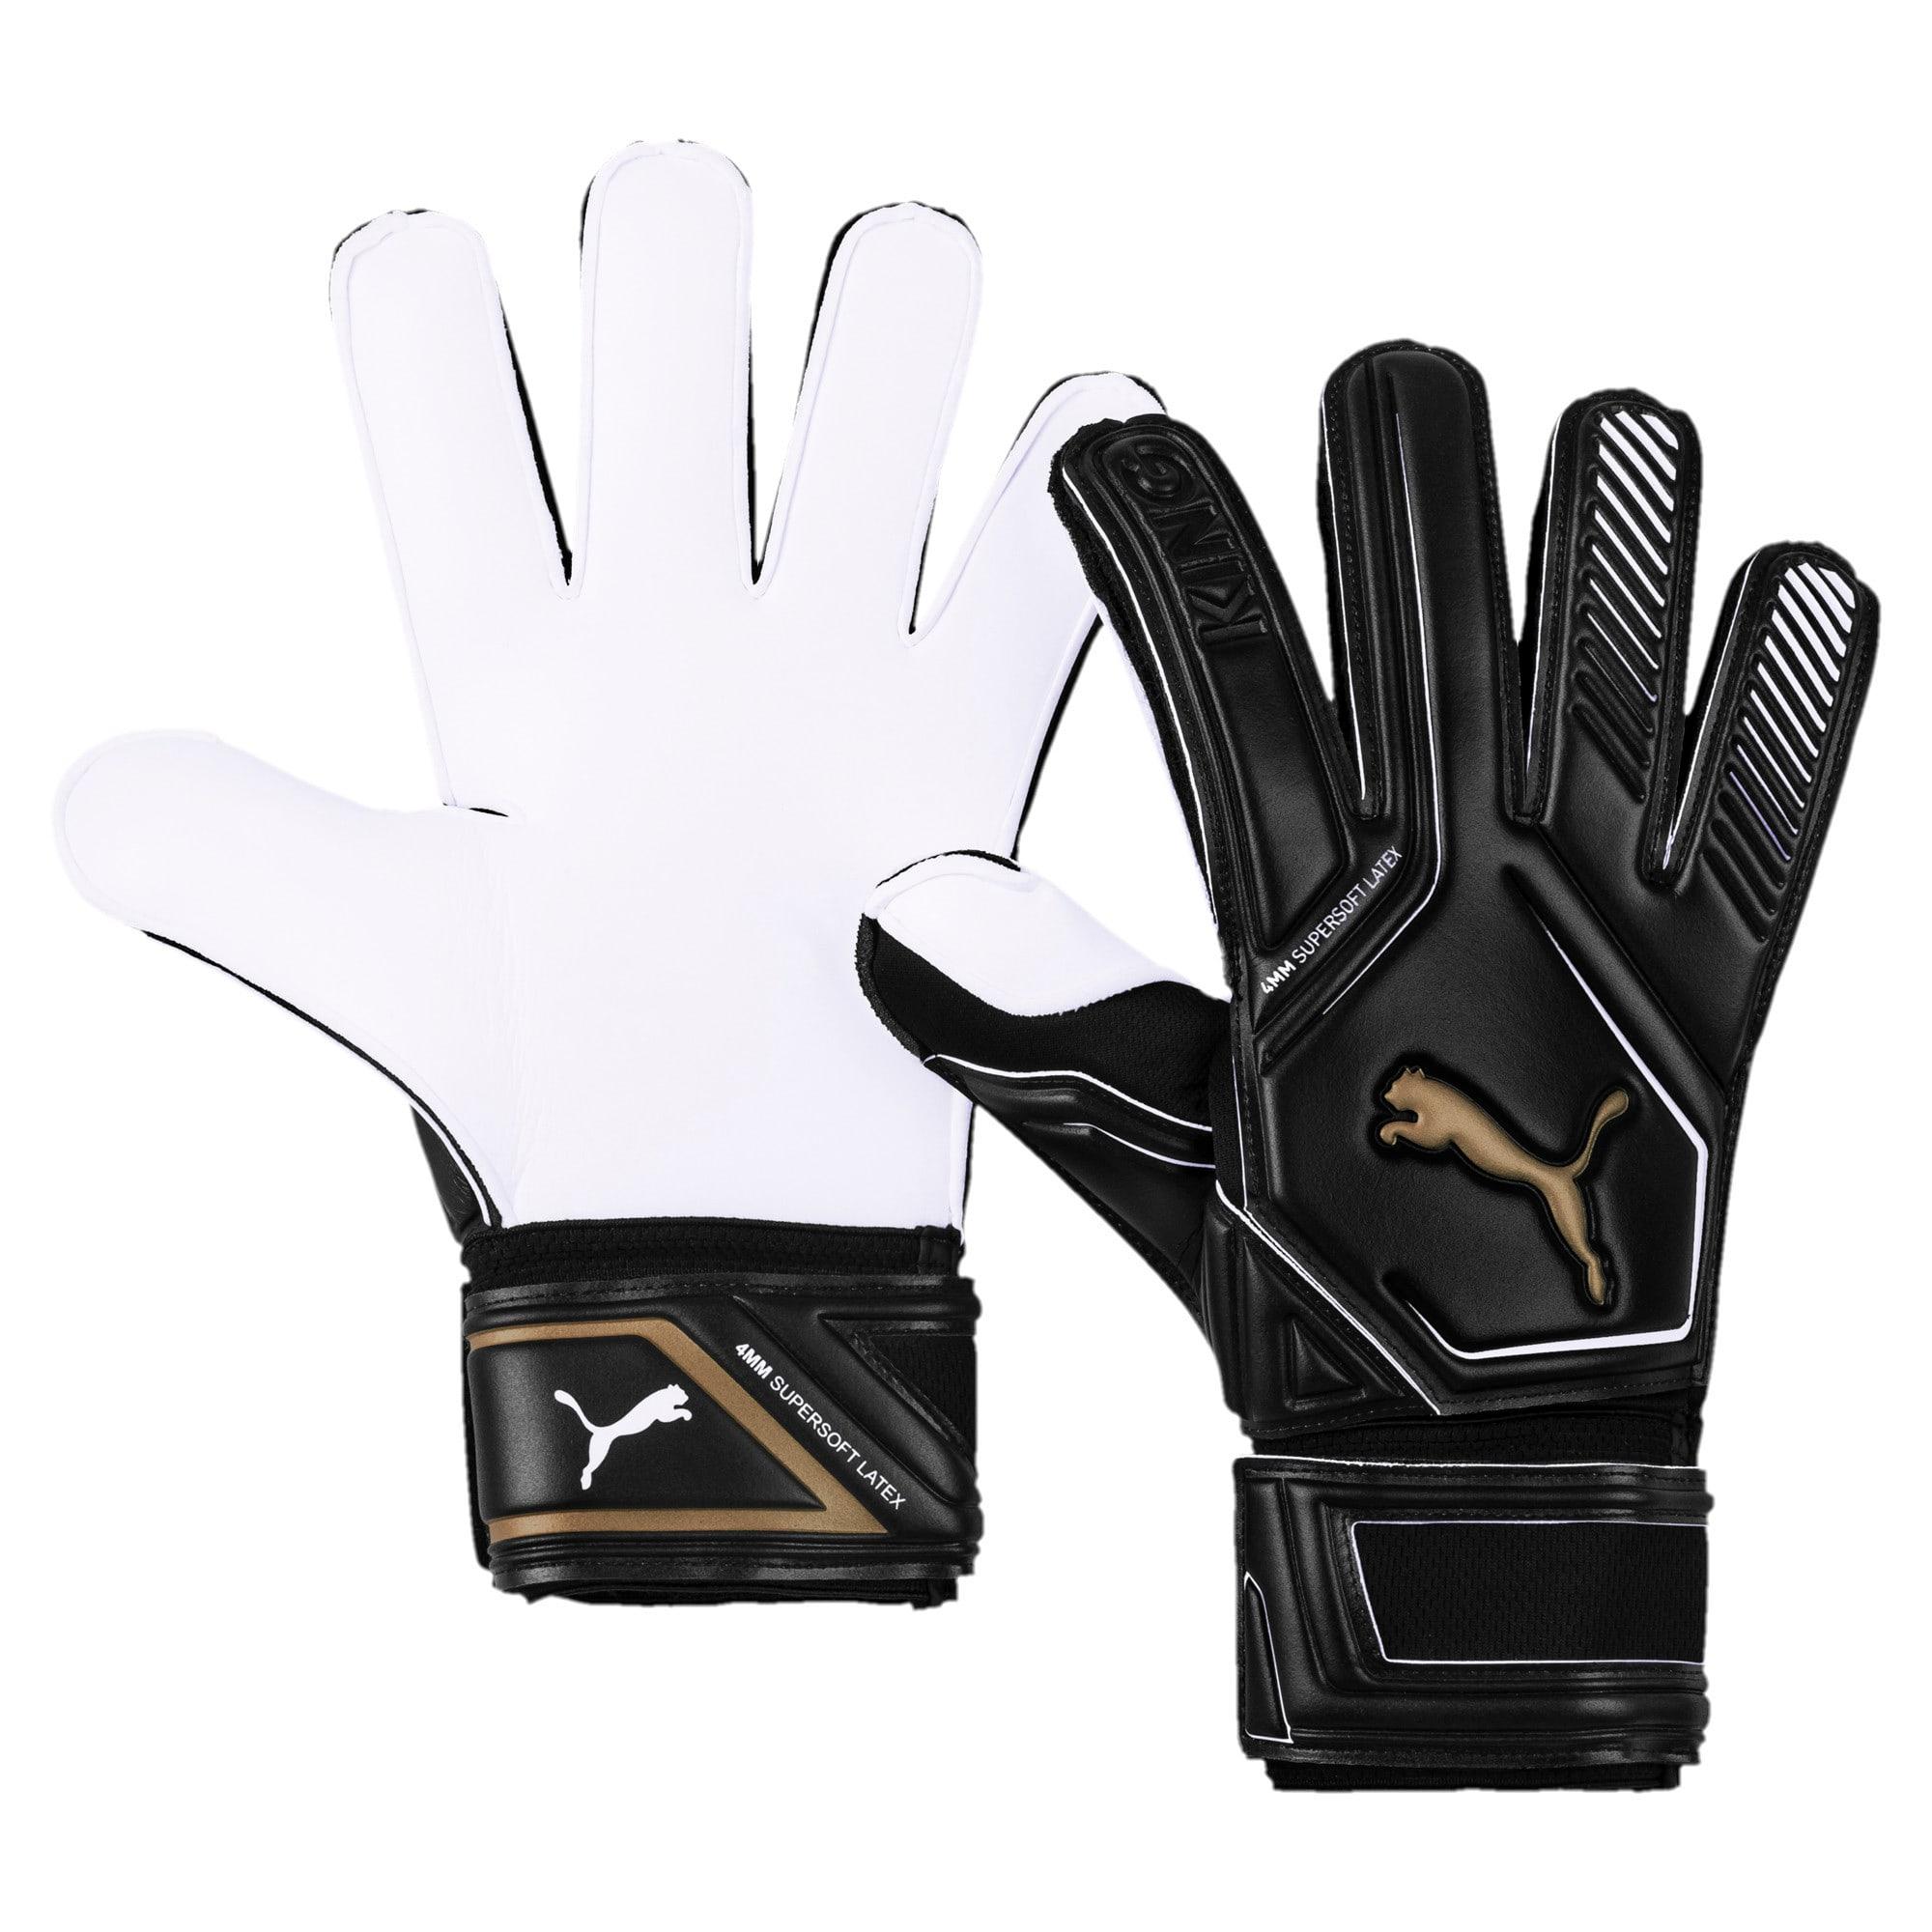 Thumbnail 1 of King RC Goalkeeper Gloves, Puma Black-Gold-Puma White, medium